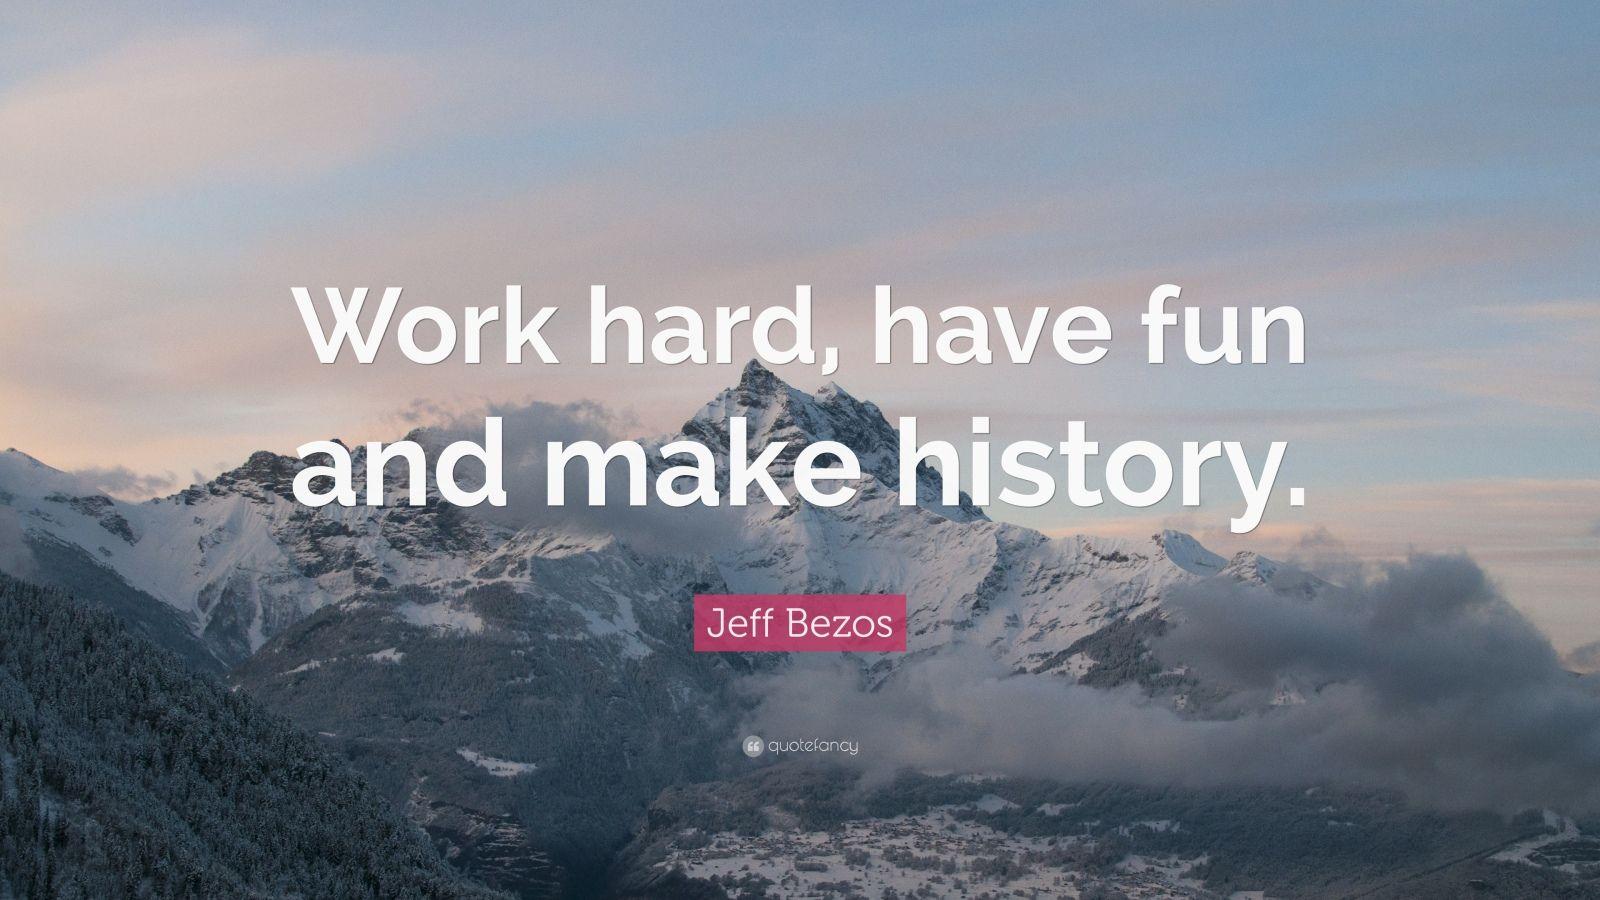 Gary Vaynerchuk Quotes Wallpaper Jeff Bezos Quote Work Hard Have Fun And Make History